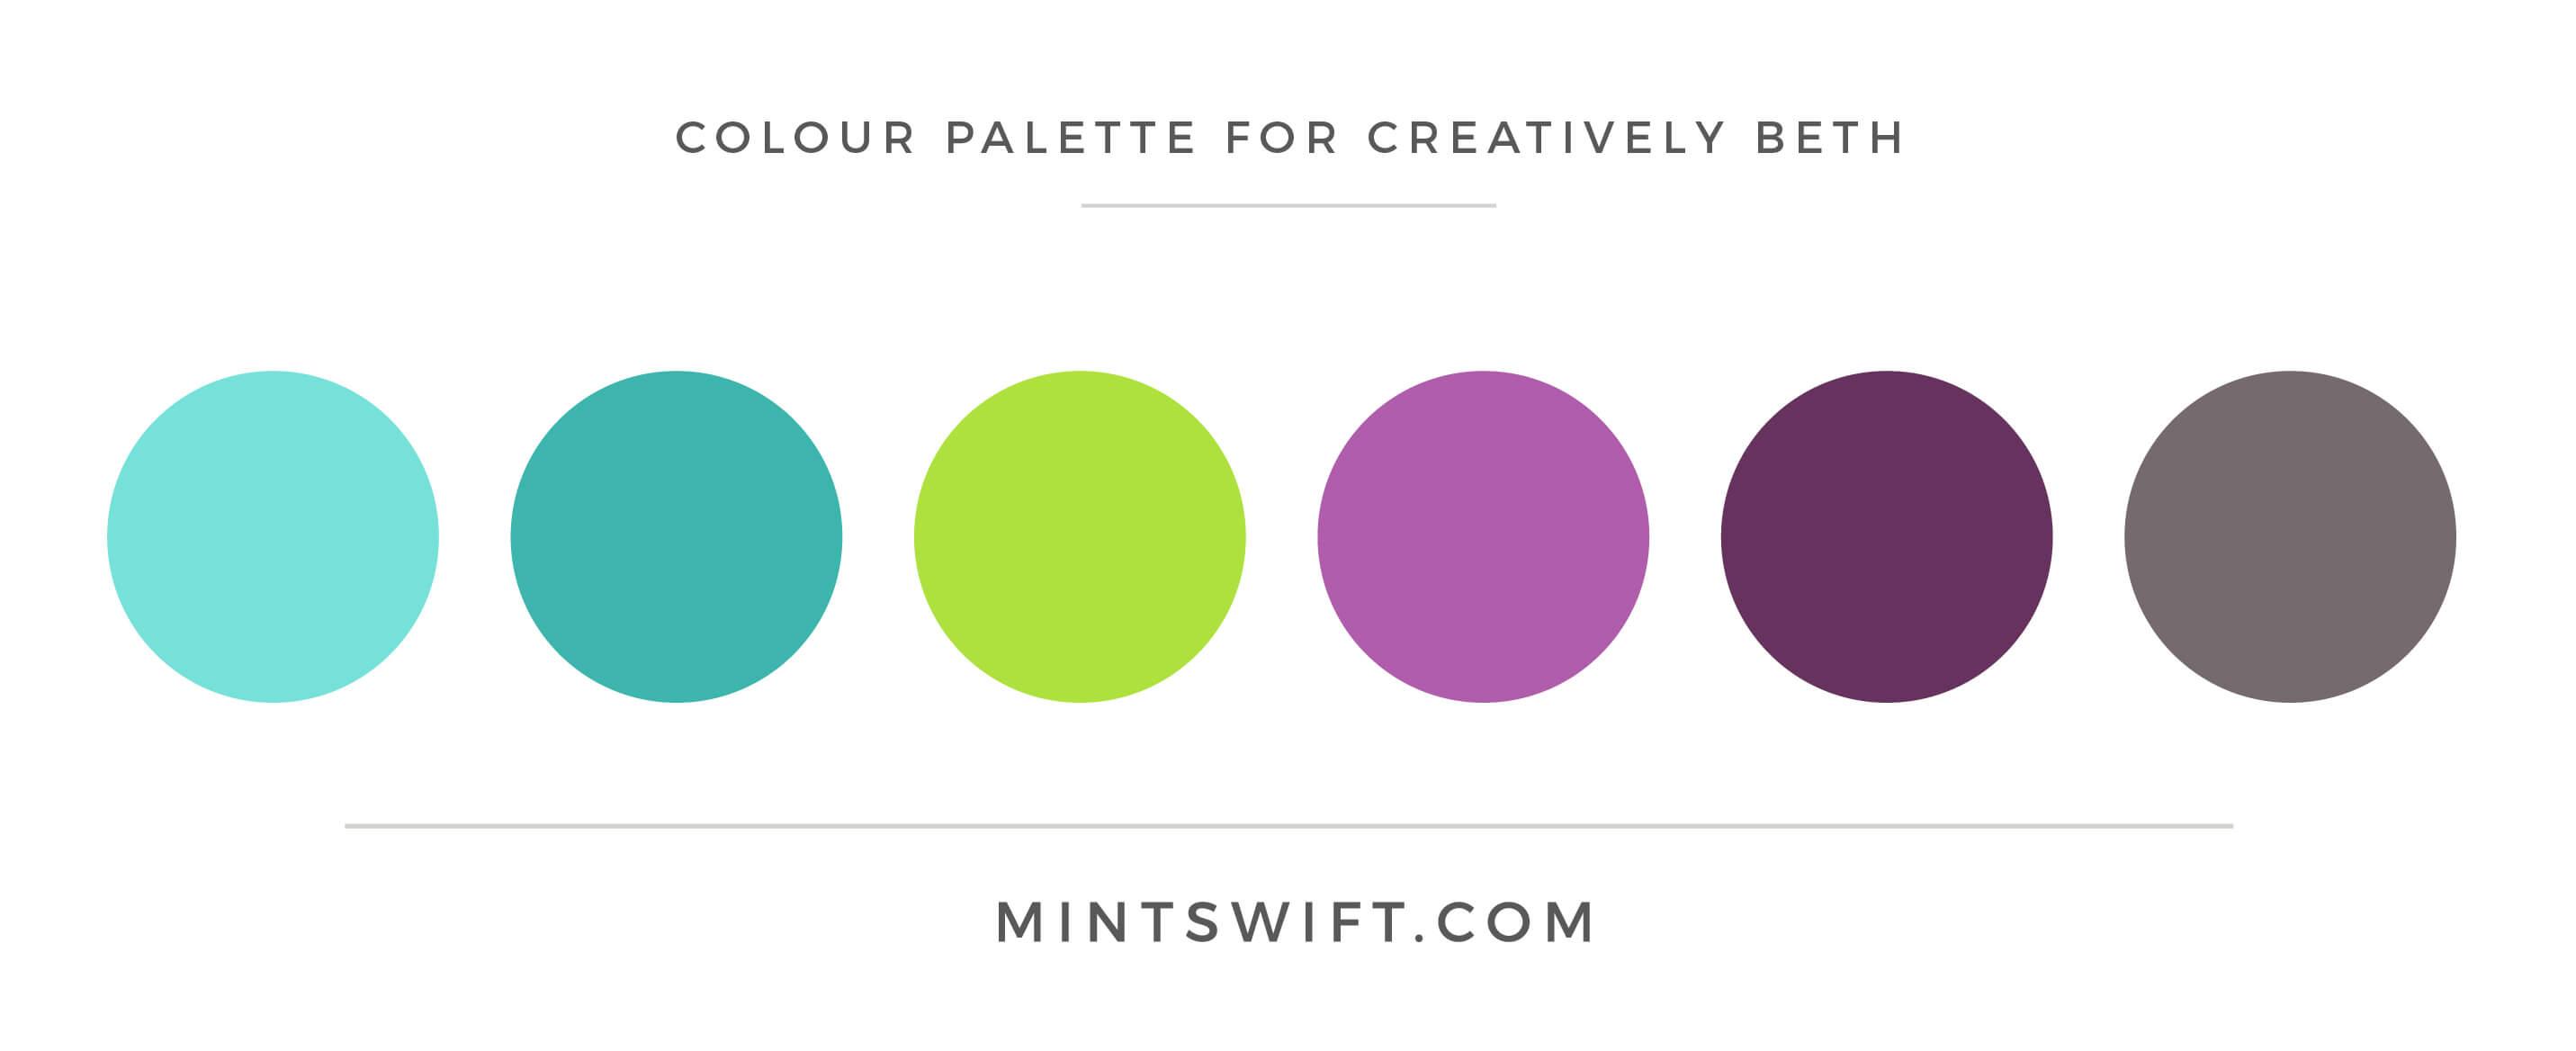 Creatively Beth - Colour Palette - Brand & Website Design - MintSwift